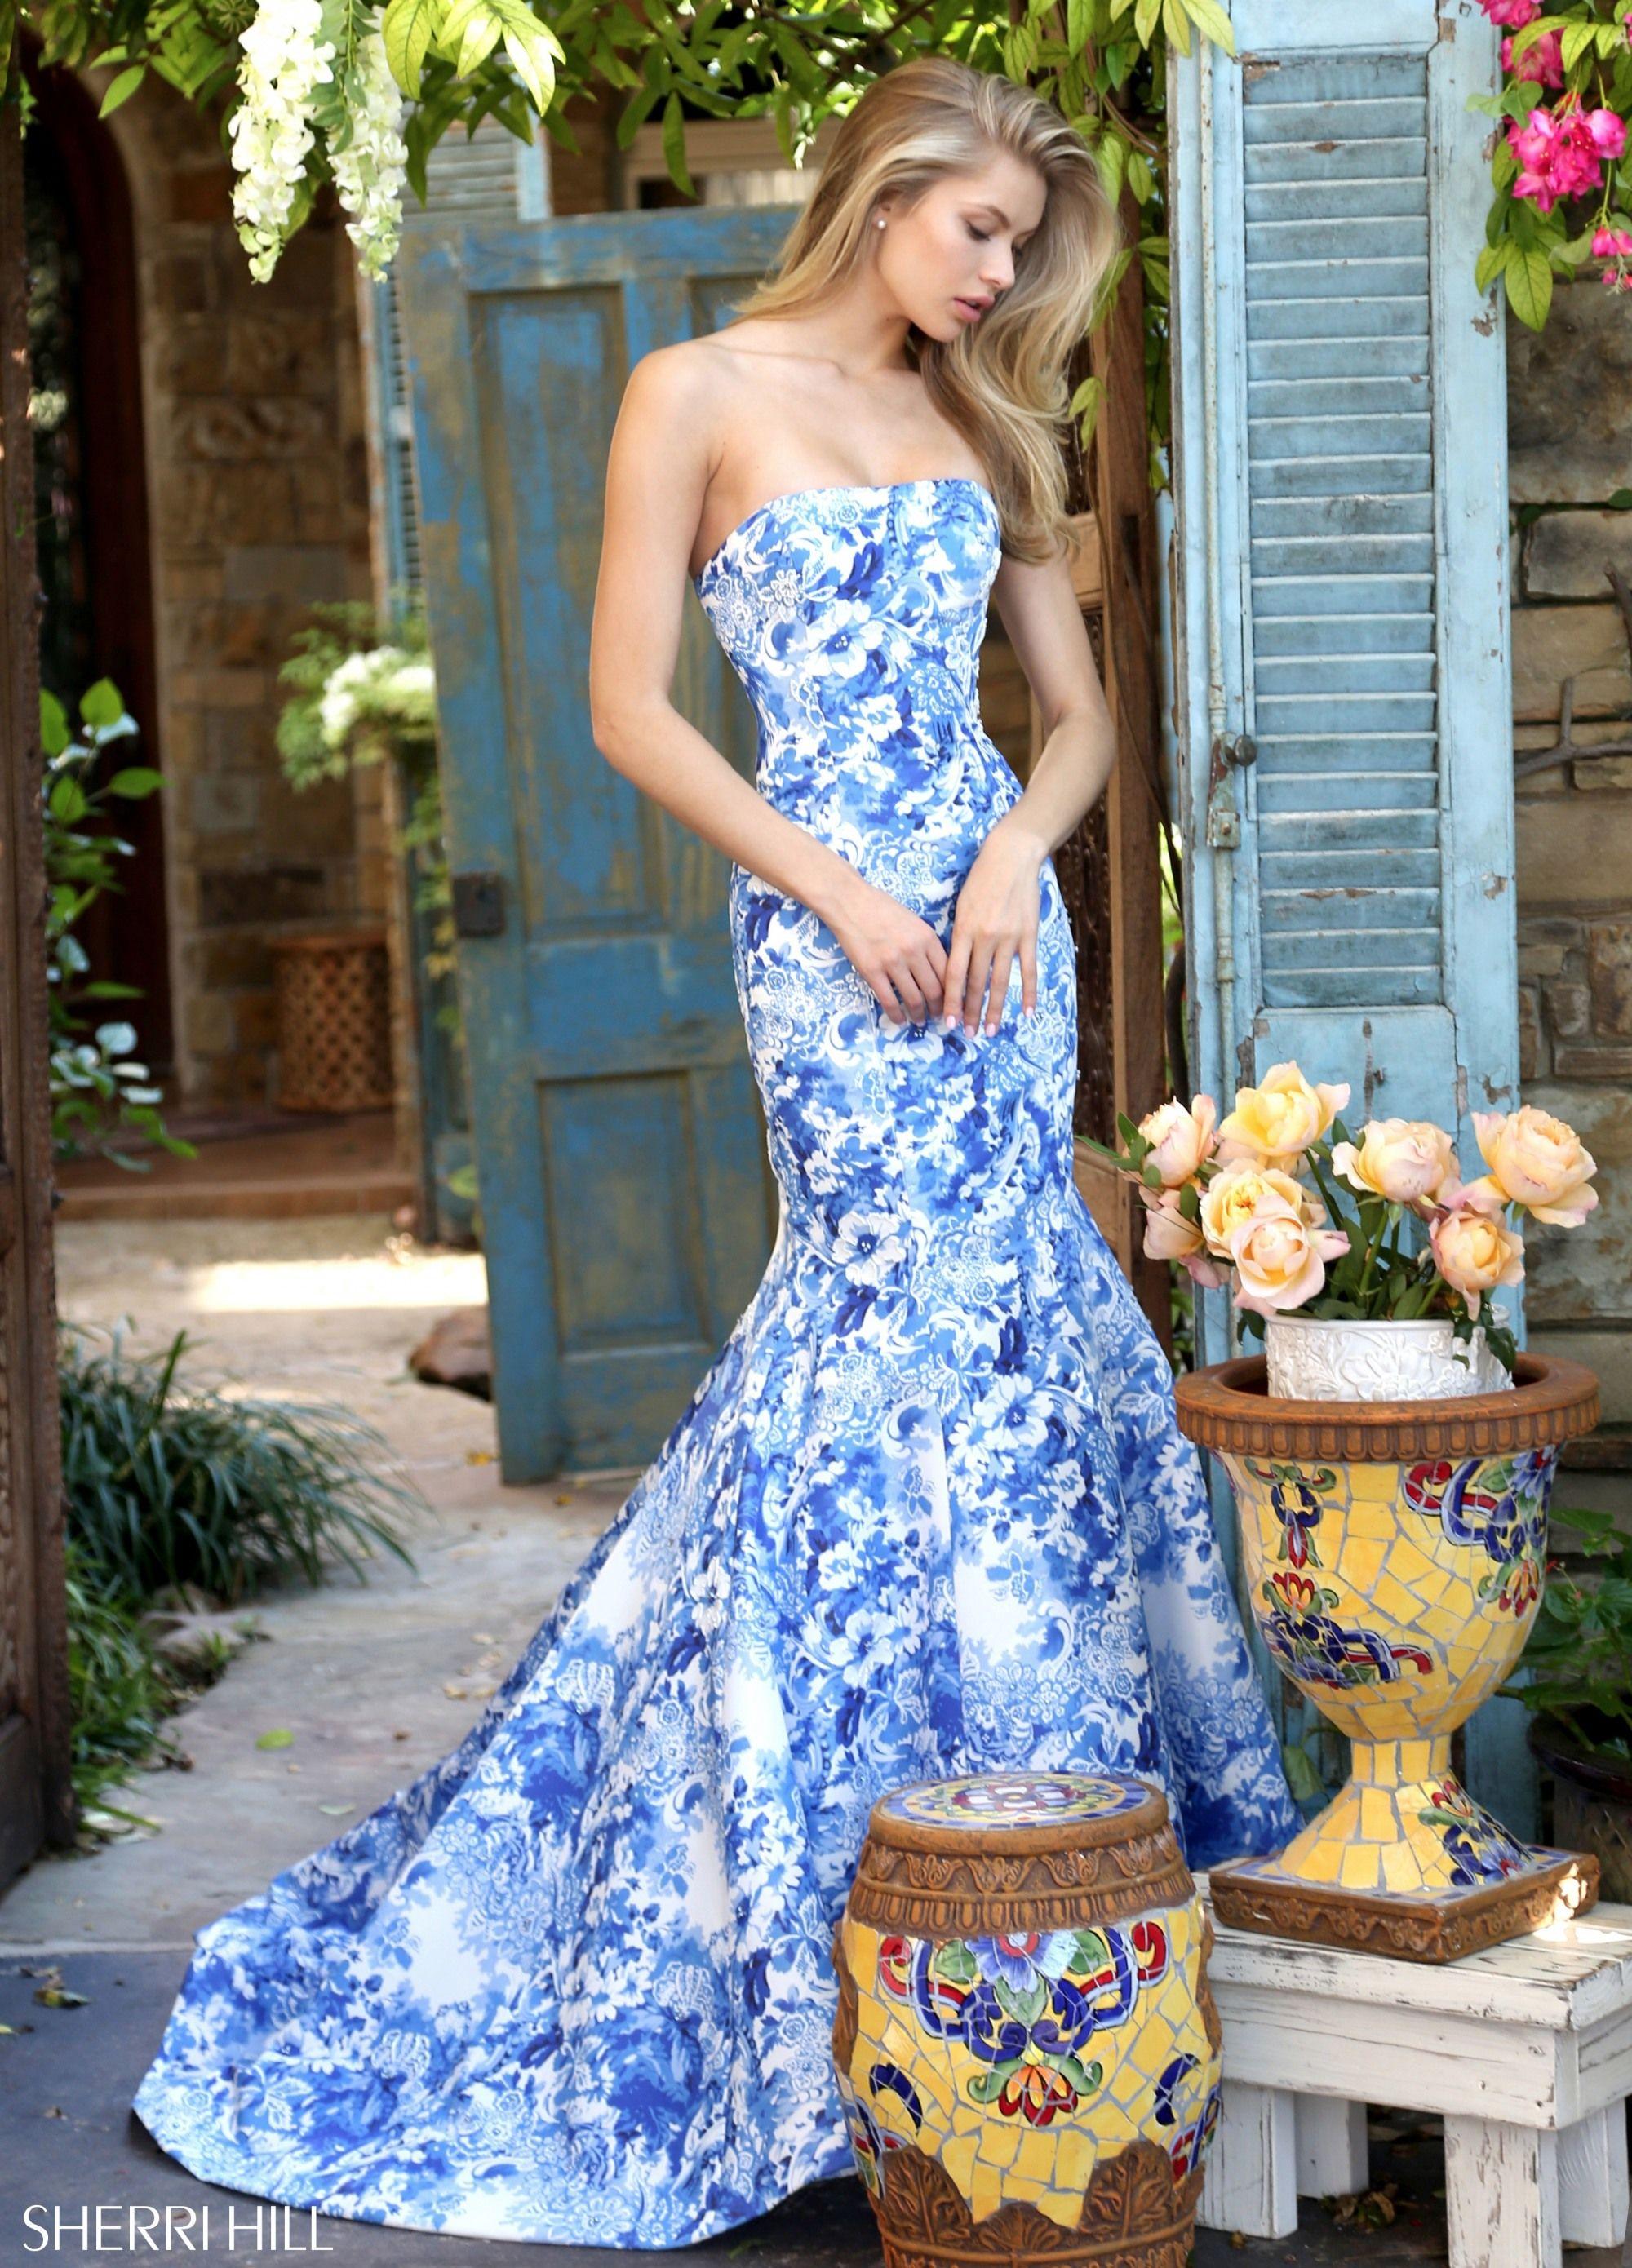 Stunning Prints And Sherri Hill Prom Dresses Sherri Hill Prom Dresses Stylish Prom Dress Gorgeous Prom Dresses [ 2780 x 2000 Pixel ]